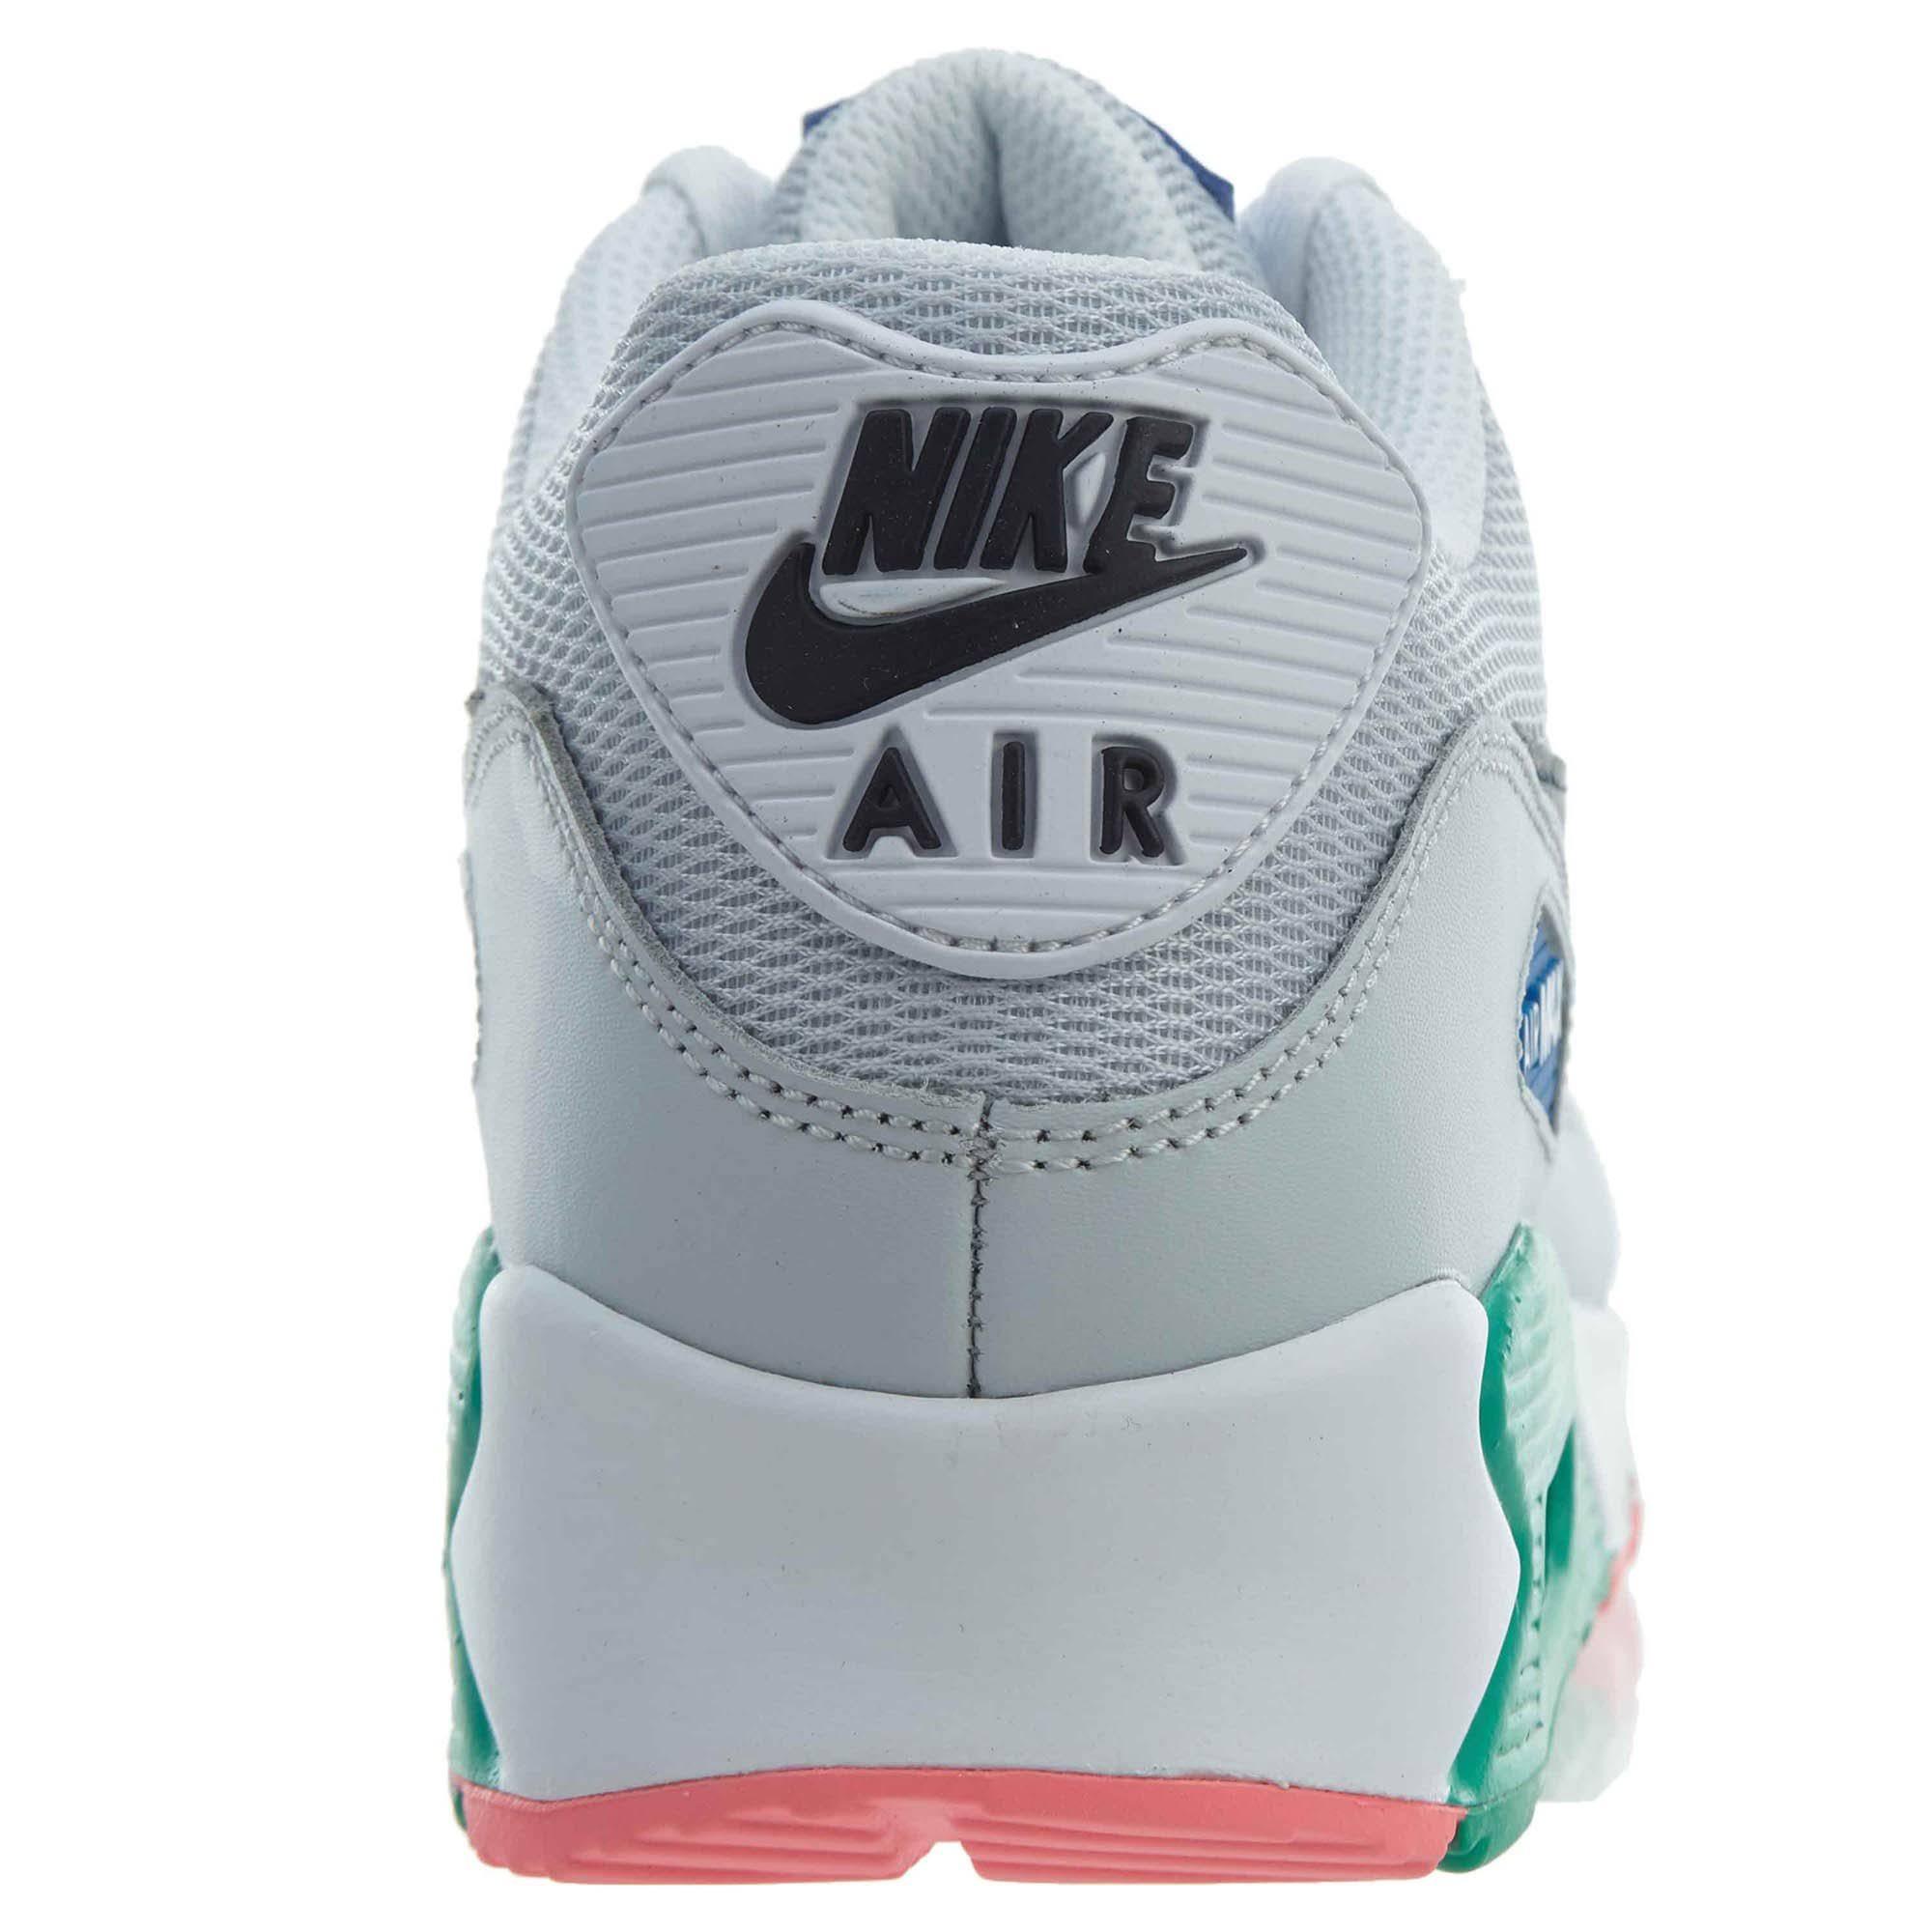 90 10 Max Air Para 5 Nike Tamaño Aj1285100 Hombre Zapatos qSUWgE